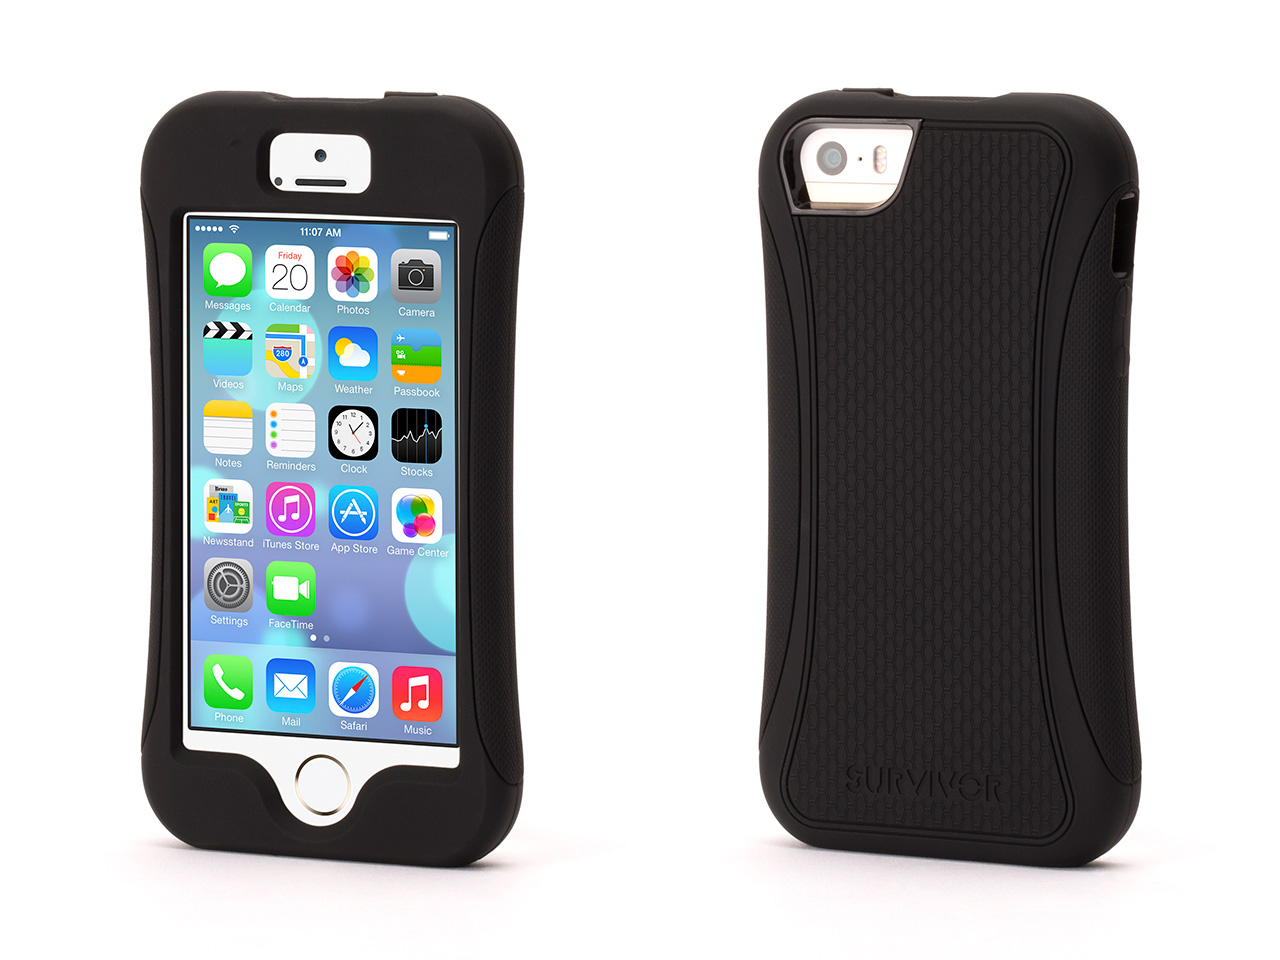 Black Survivor Slim Protective case for iPhone 5/5s